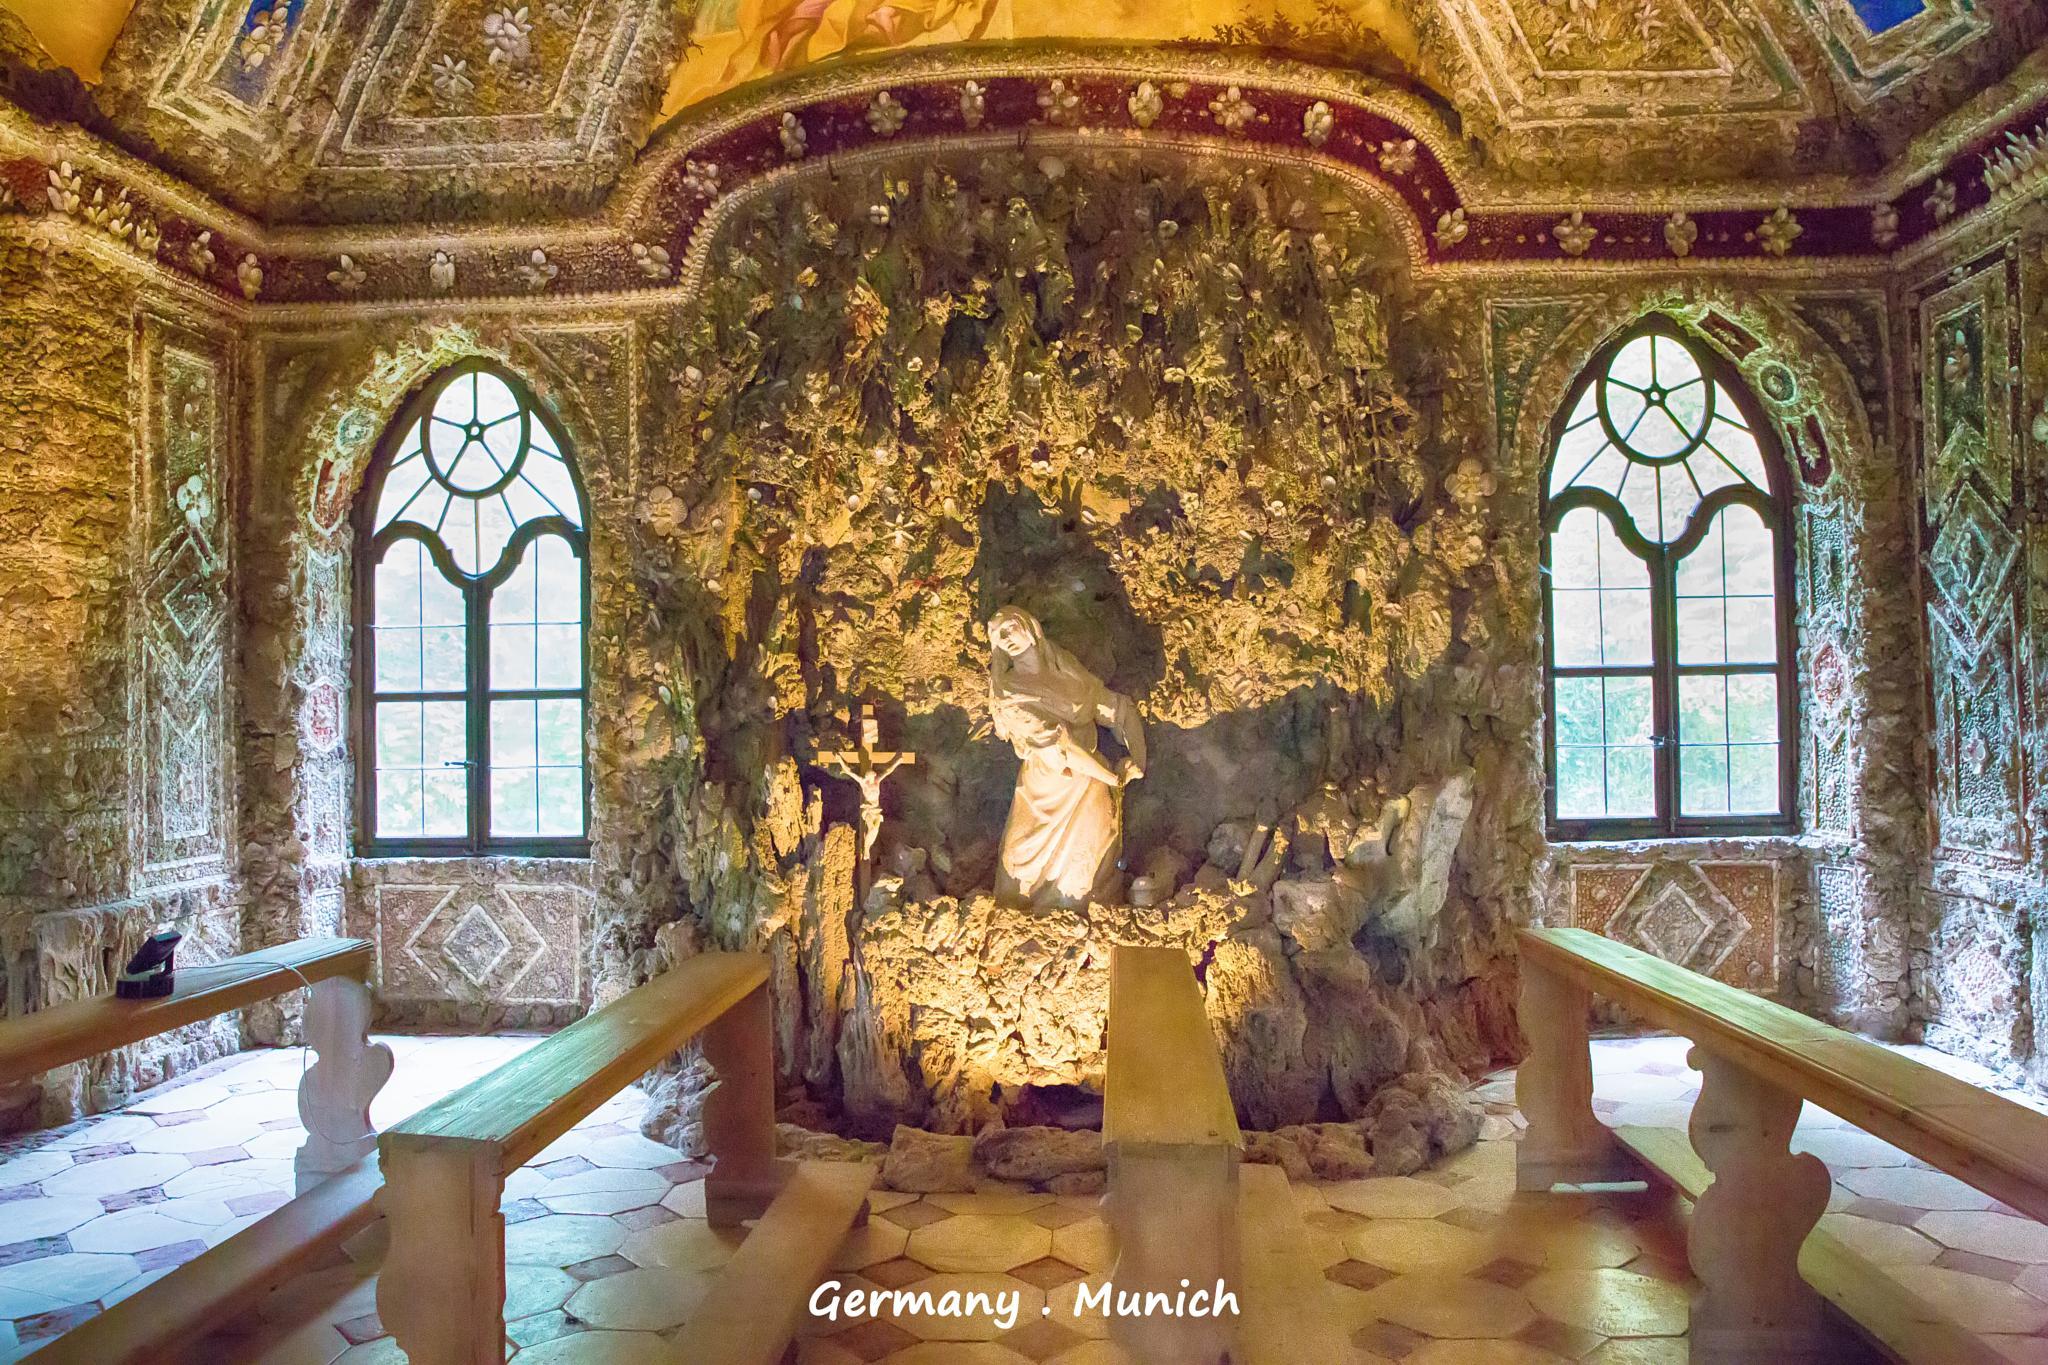 Germany . Munich . Nymphenburg by WaiWai Chung